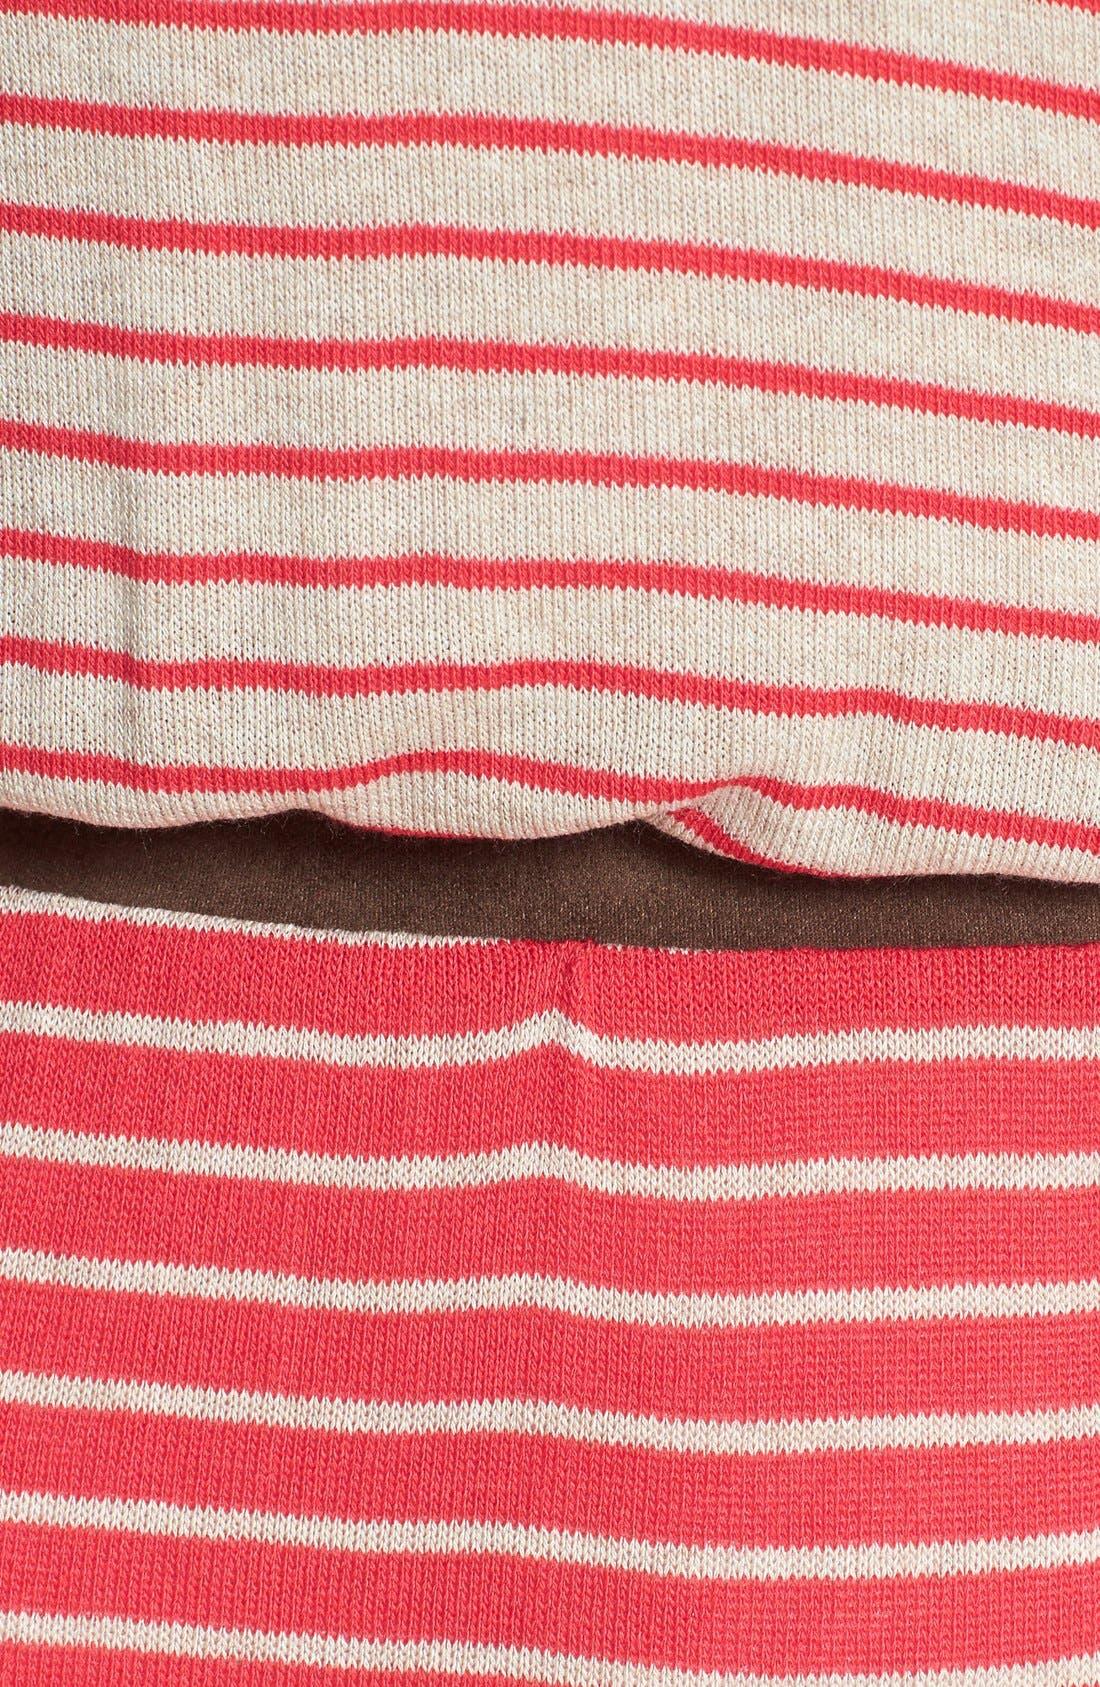 Alternate Image 3  - Tart 'Maris' Faux Suede Trim Stripe Maxi Dress